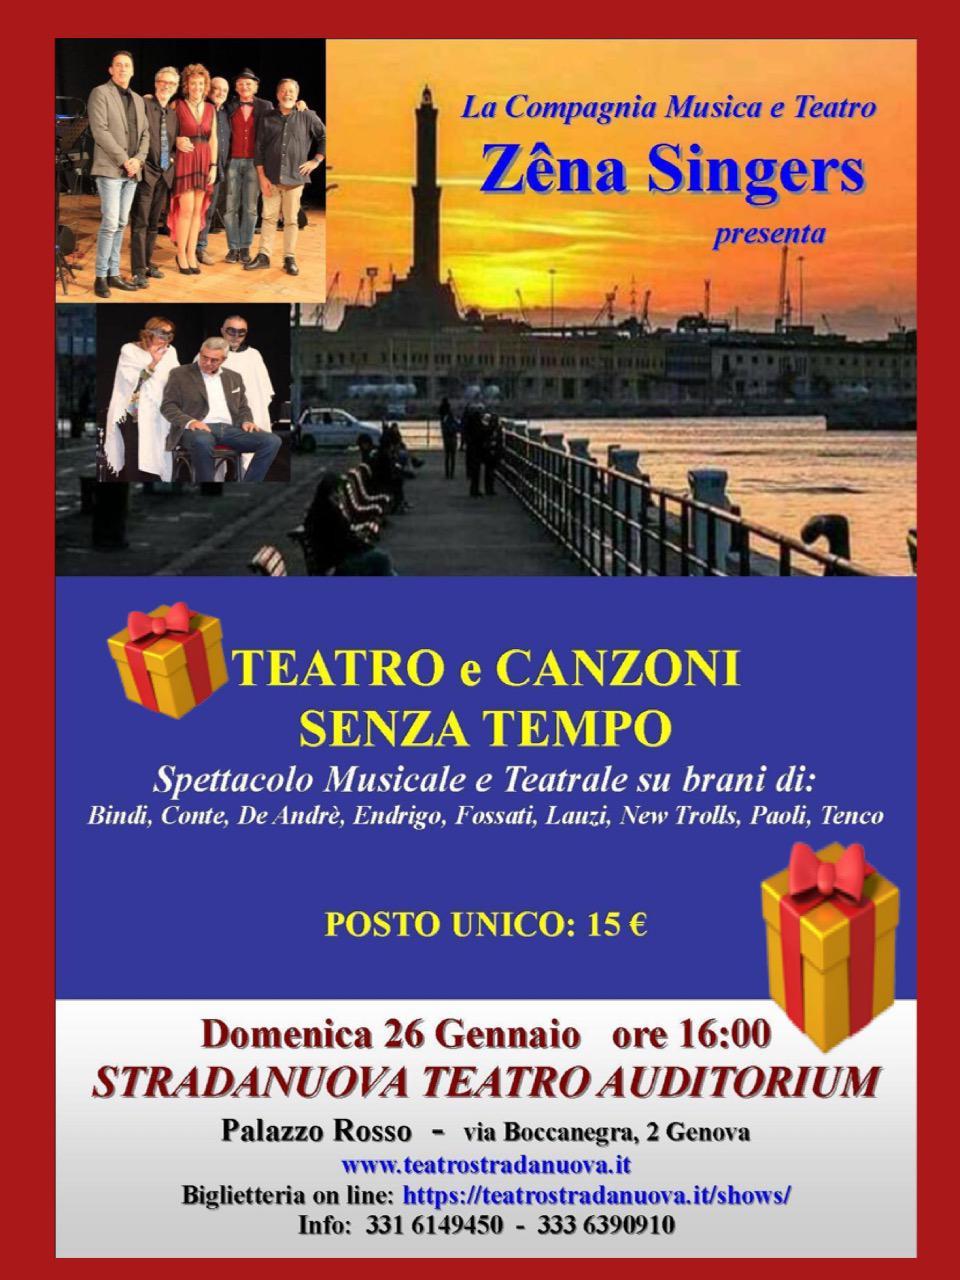 Nuovo appuntamento Zena Singers